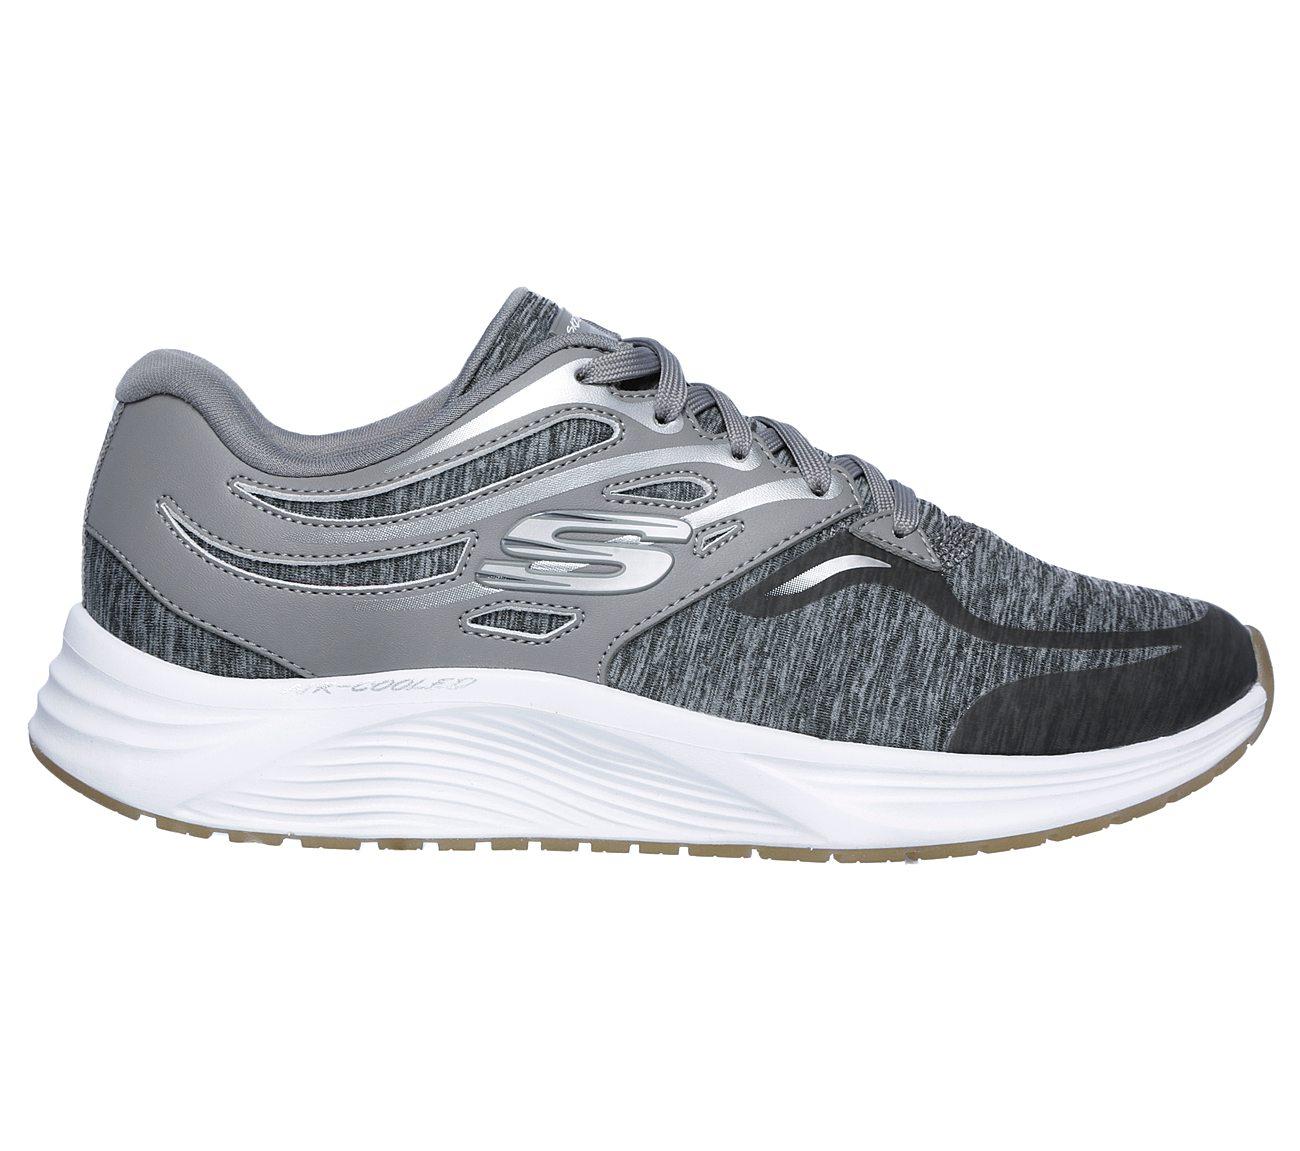 SKECHERS Skyline - Dashin Thru Sport Shoes